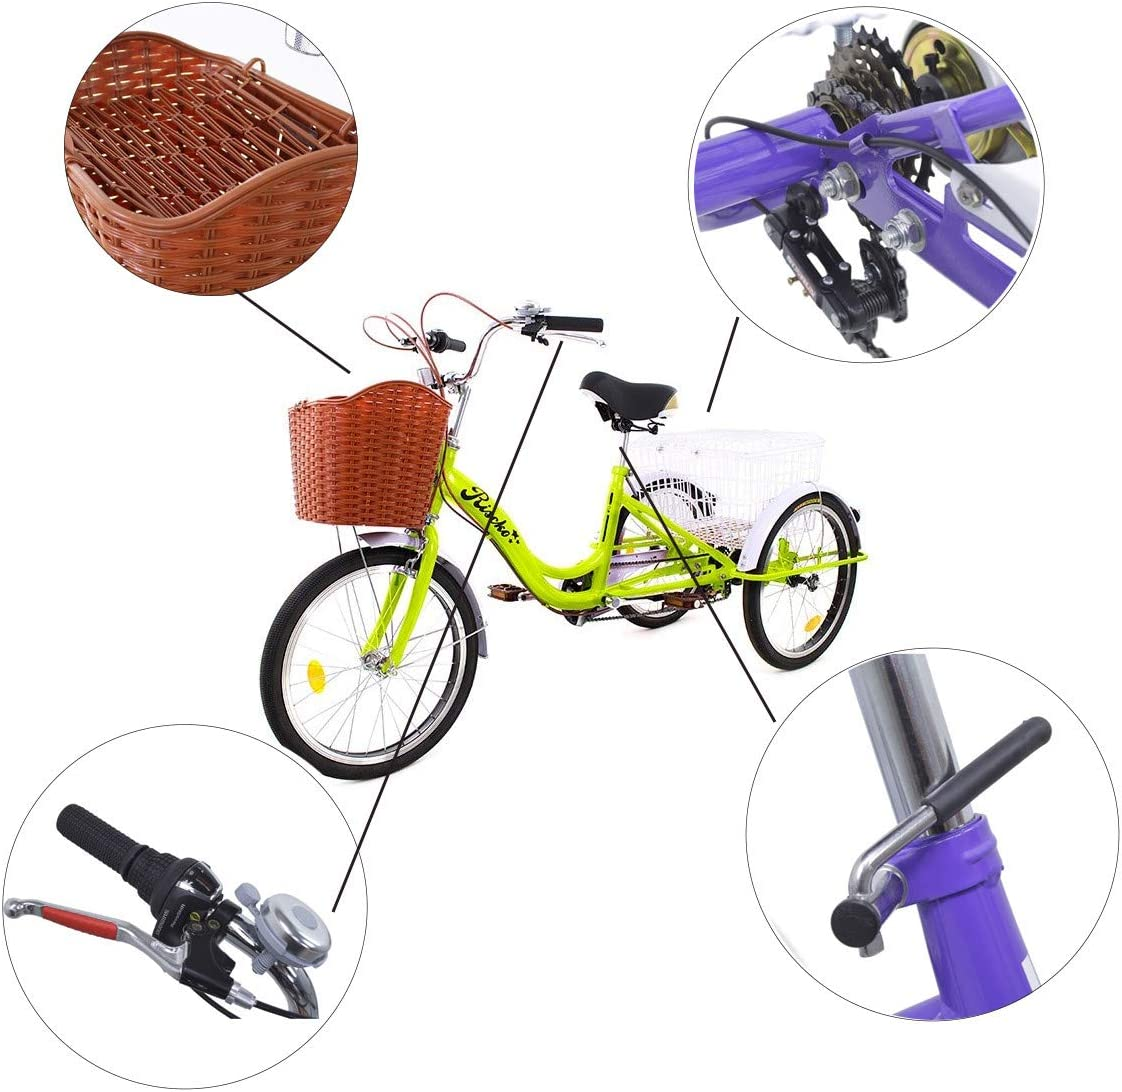 Riscko - Triciclo Adulto con Dos Cestas Bep-14 | Naranja Fluor sin ...